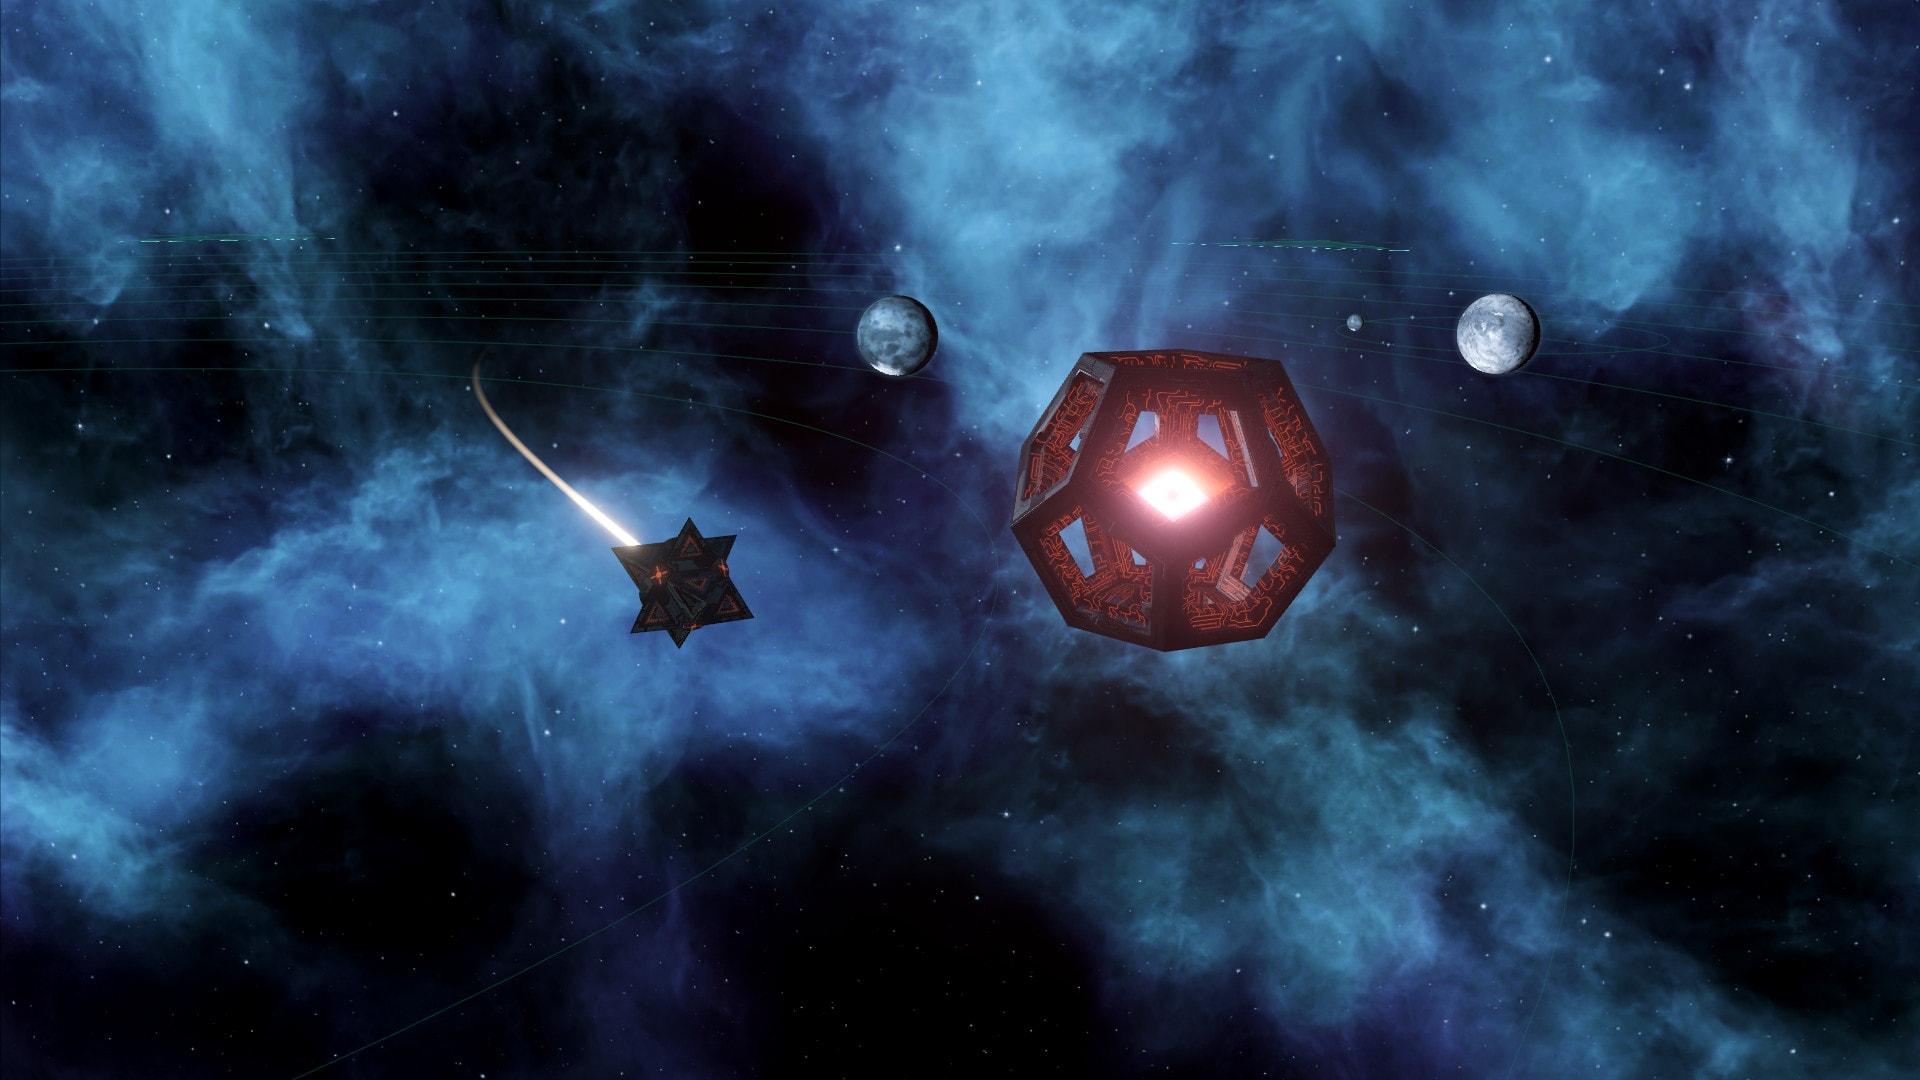 Stellaris: Synthetic Dawn Story Pack PC Steam Key GLOBAL - 3